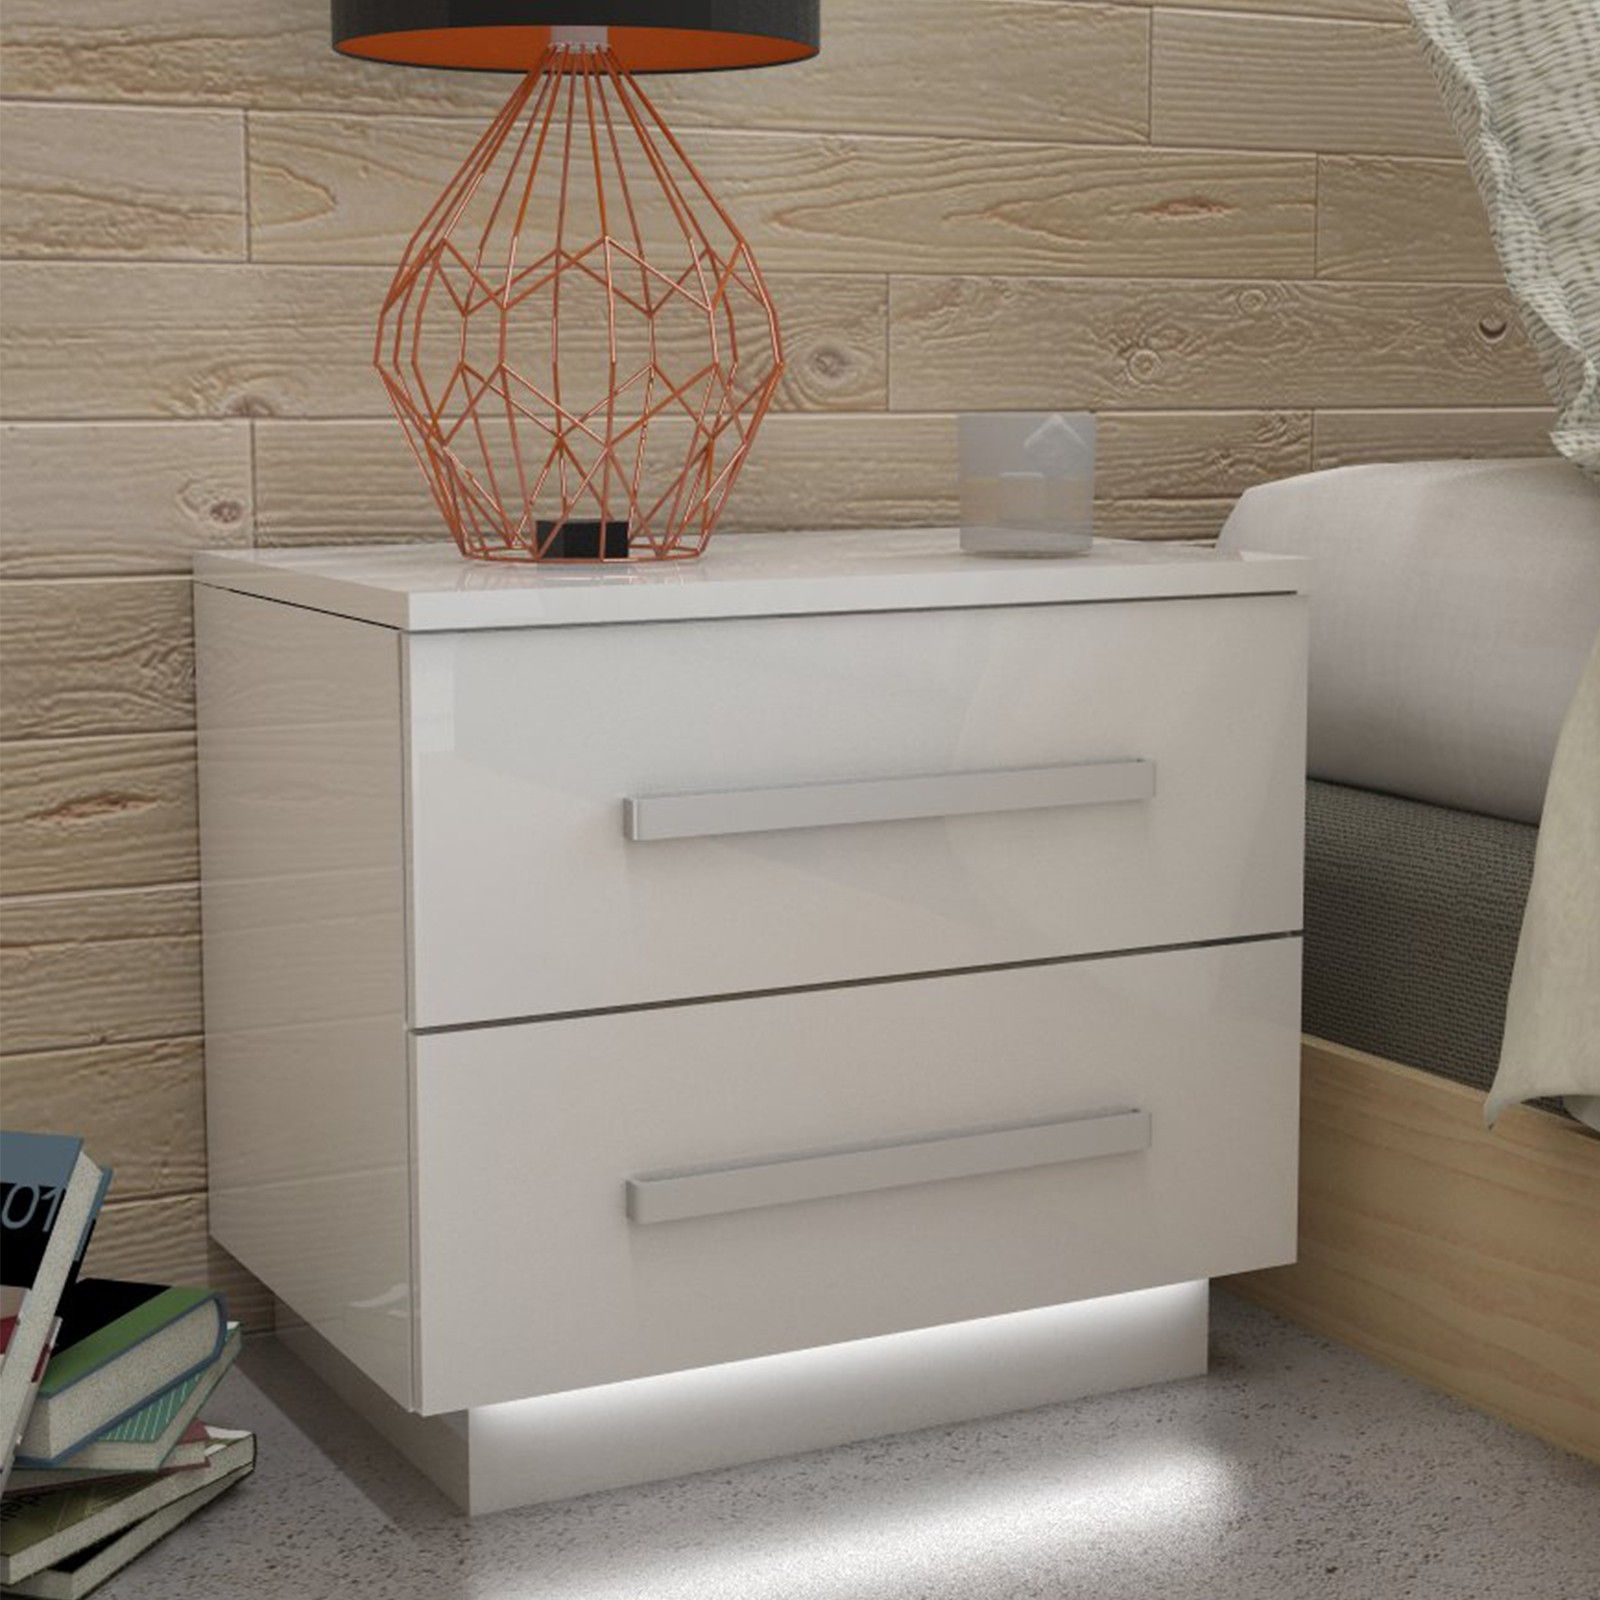 nachttisch led kommode hochglanz nachtschrank wei beleuchtung wei ebay